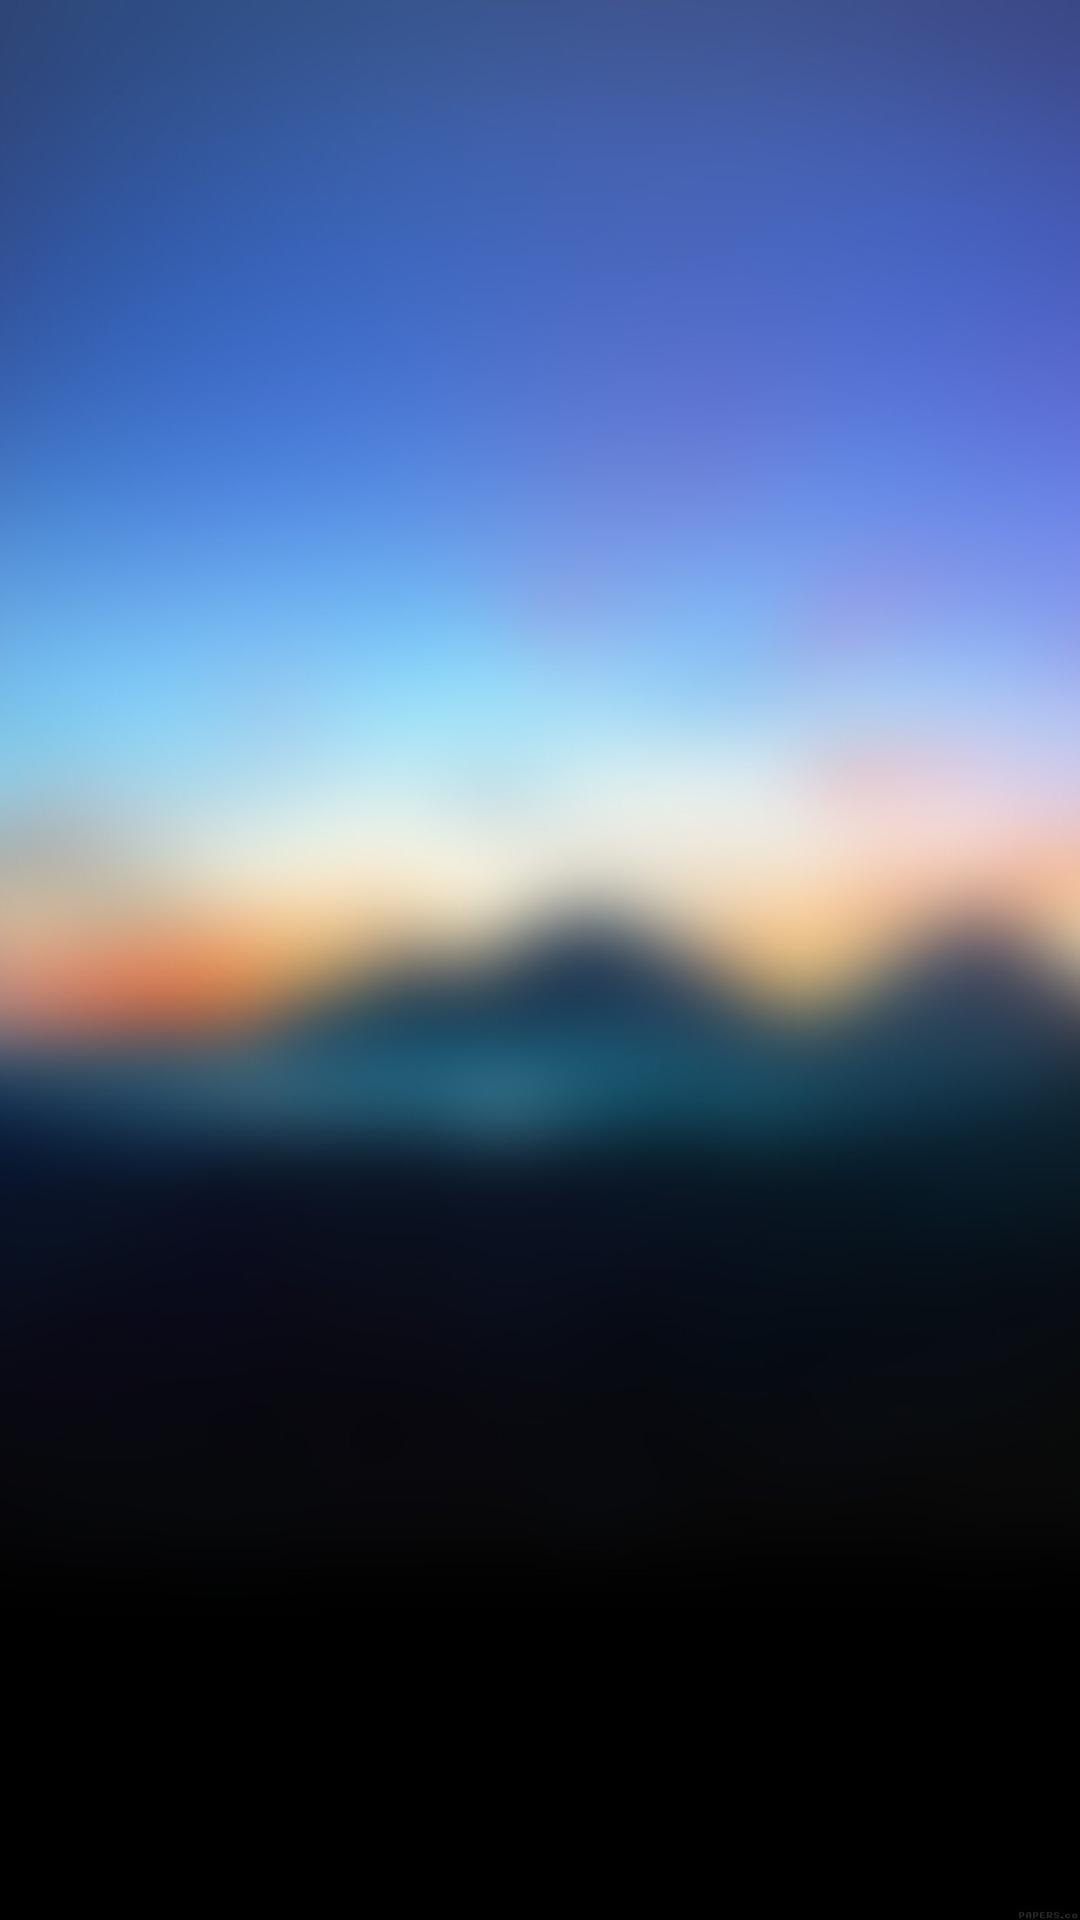 Mountain-Sunrise-Gradation-Blur-iphone-6-wallpaper-ilikewallpaper_com.jpg